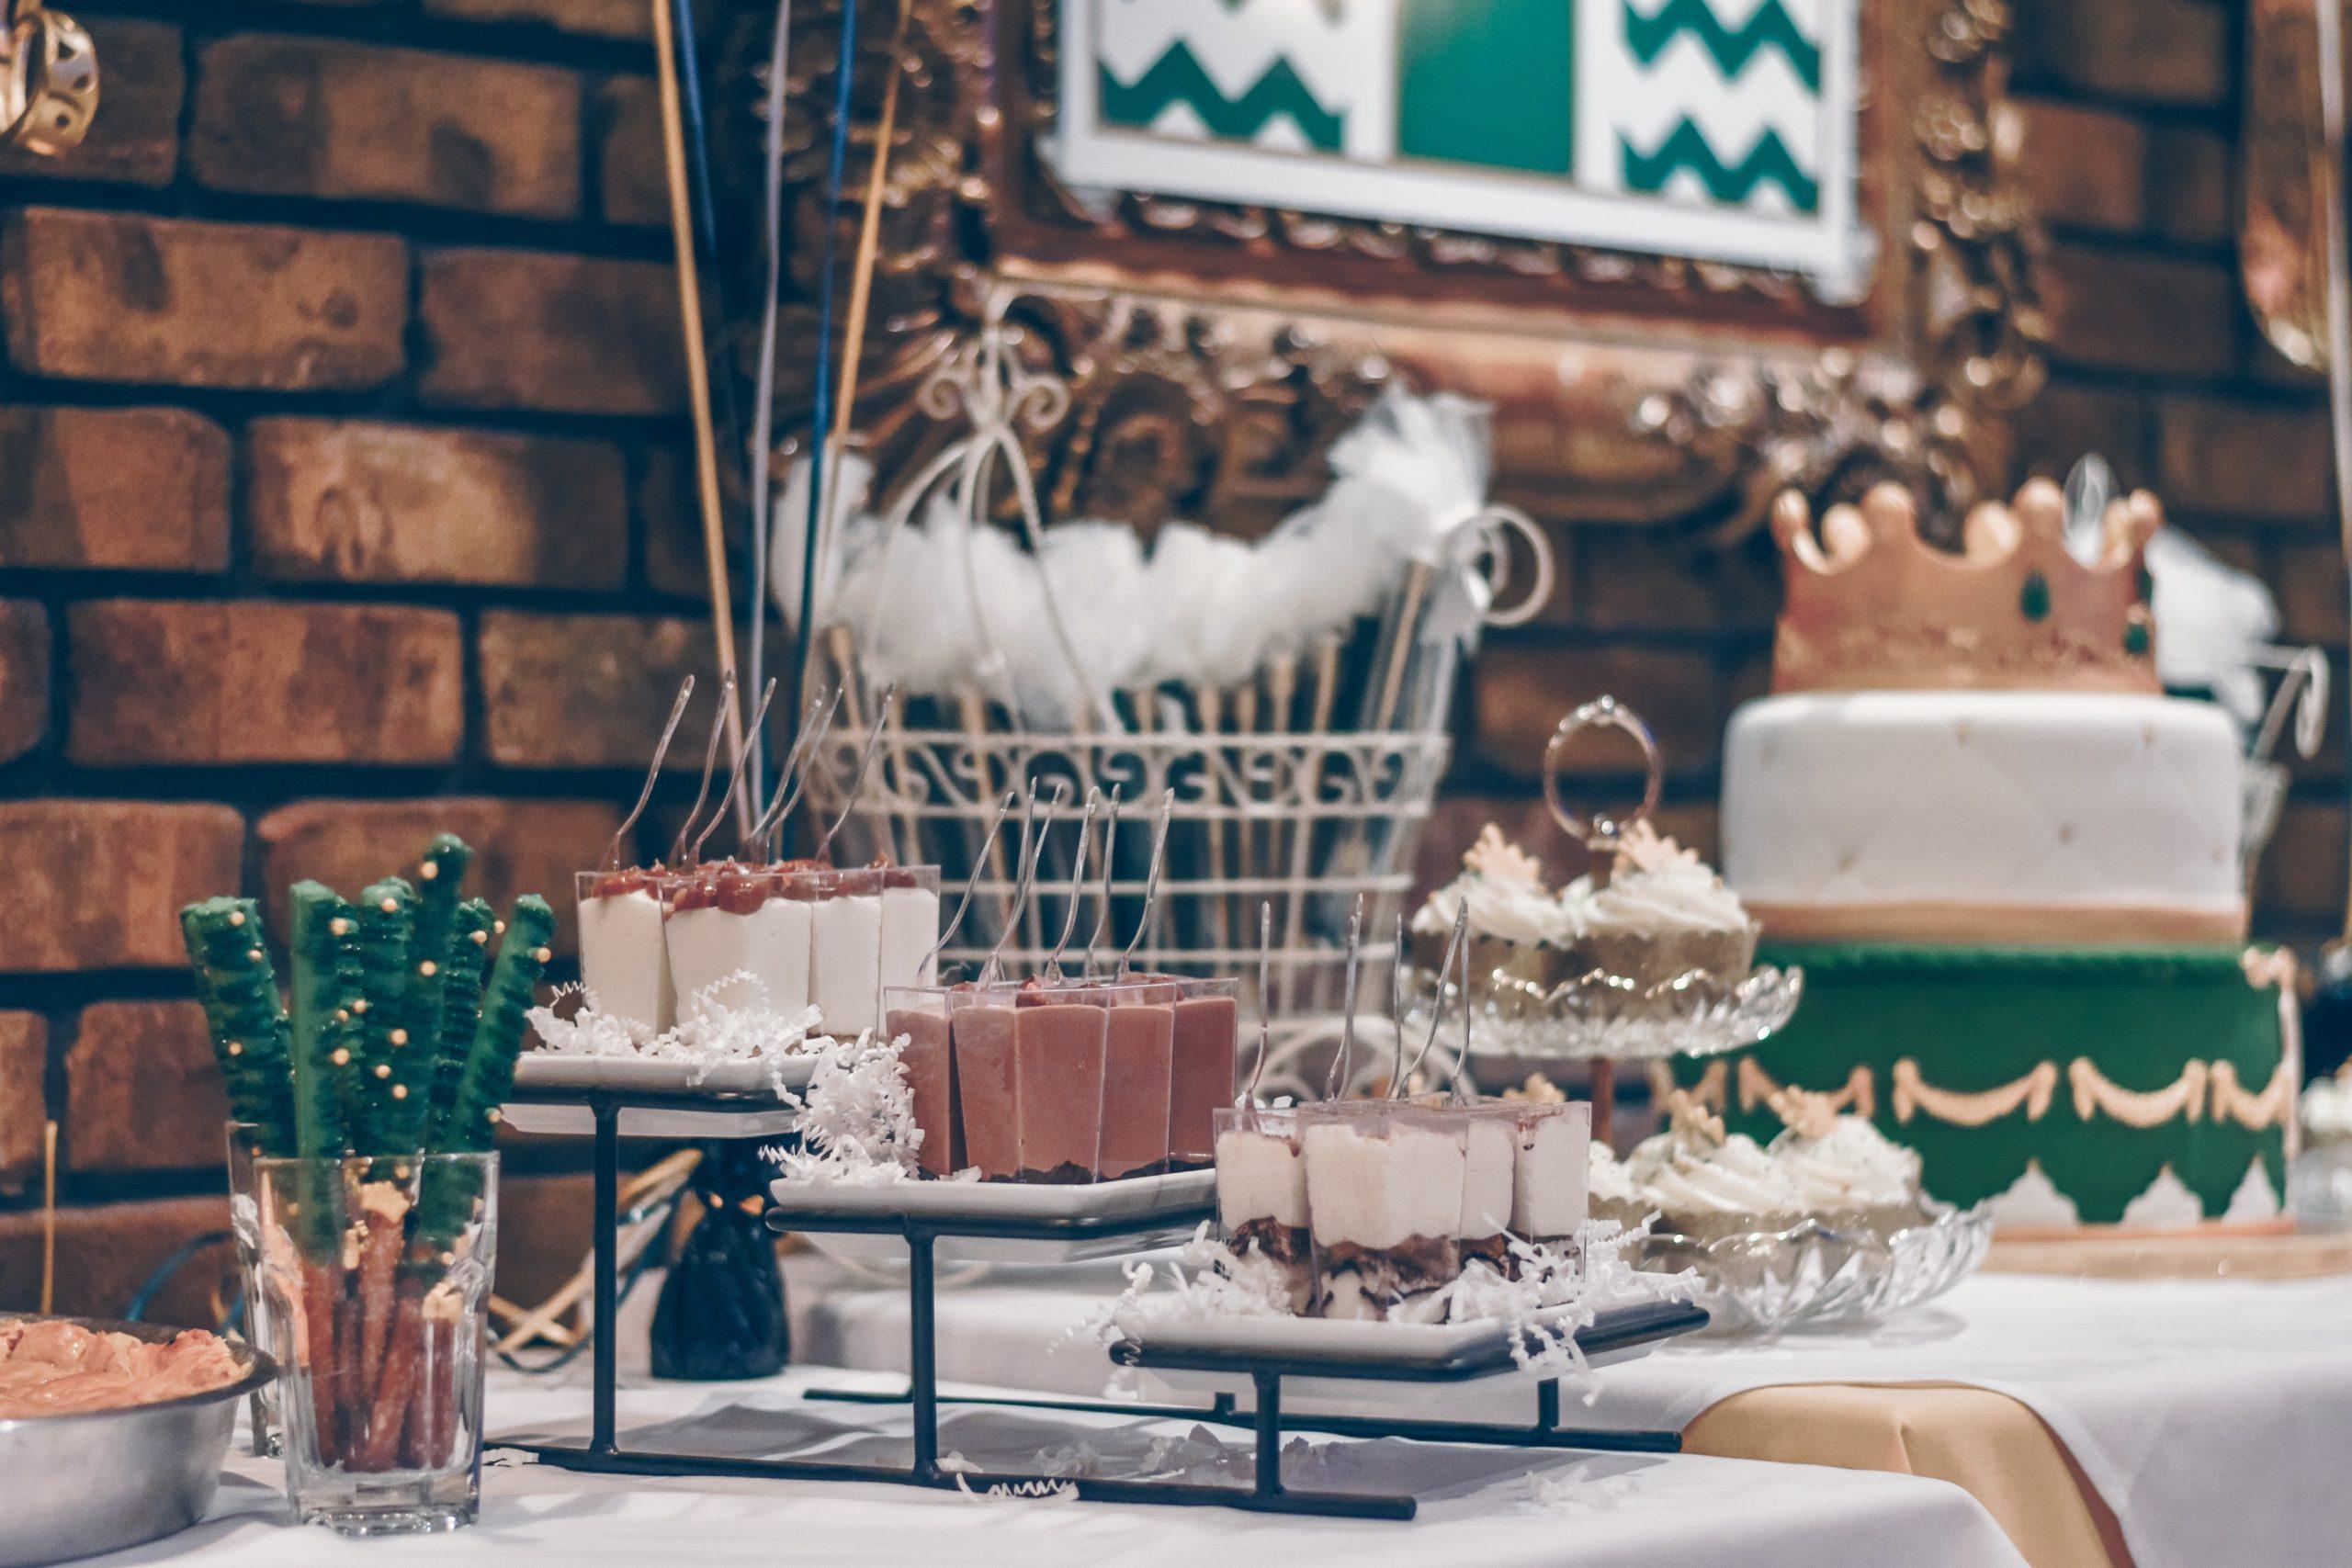 Poradnik ślubny - kto organizuje wieczór panieński?